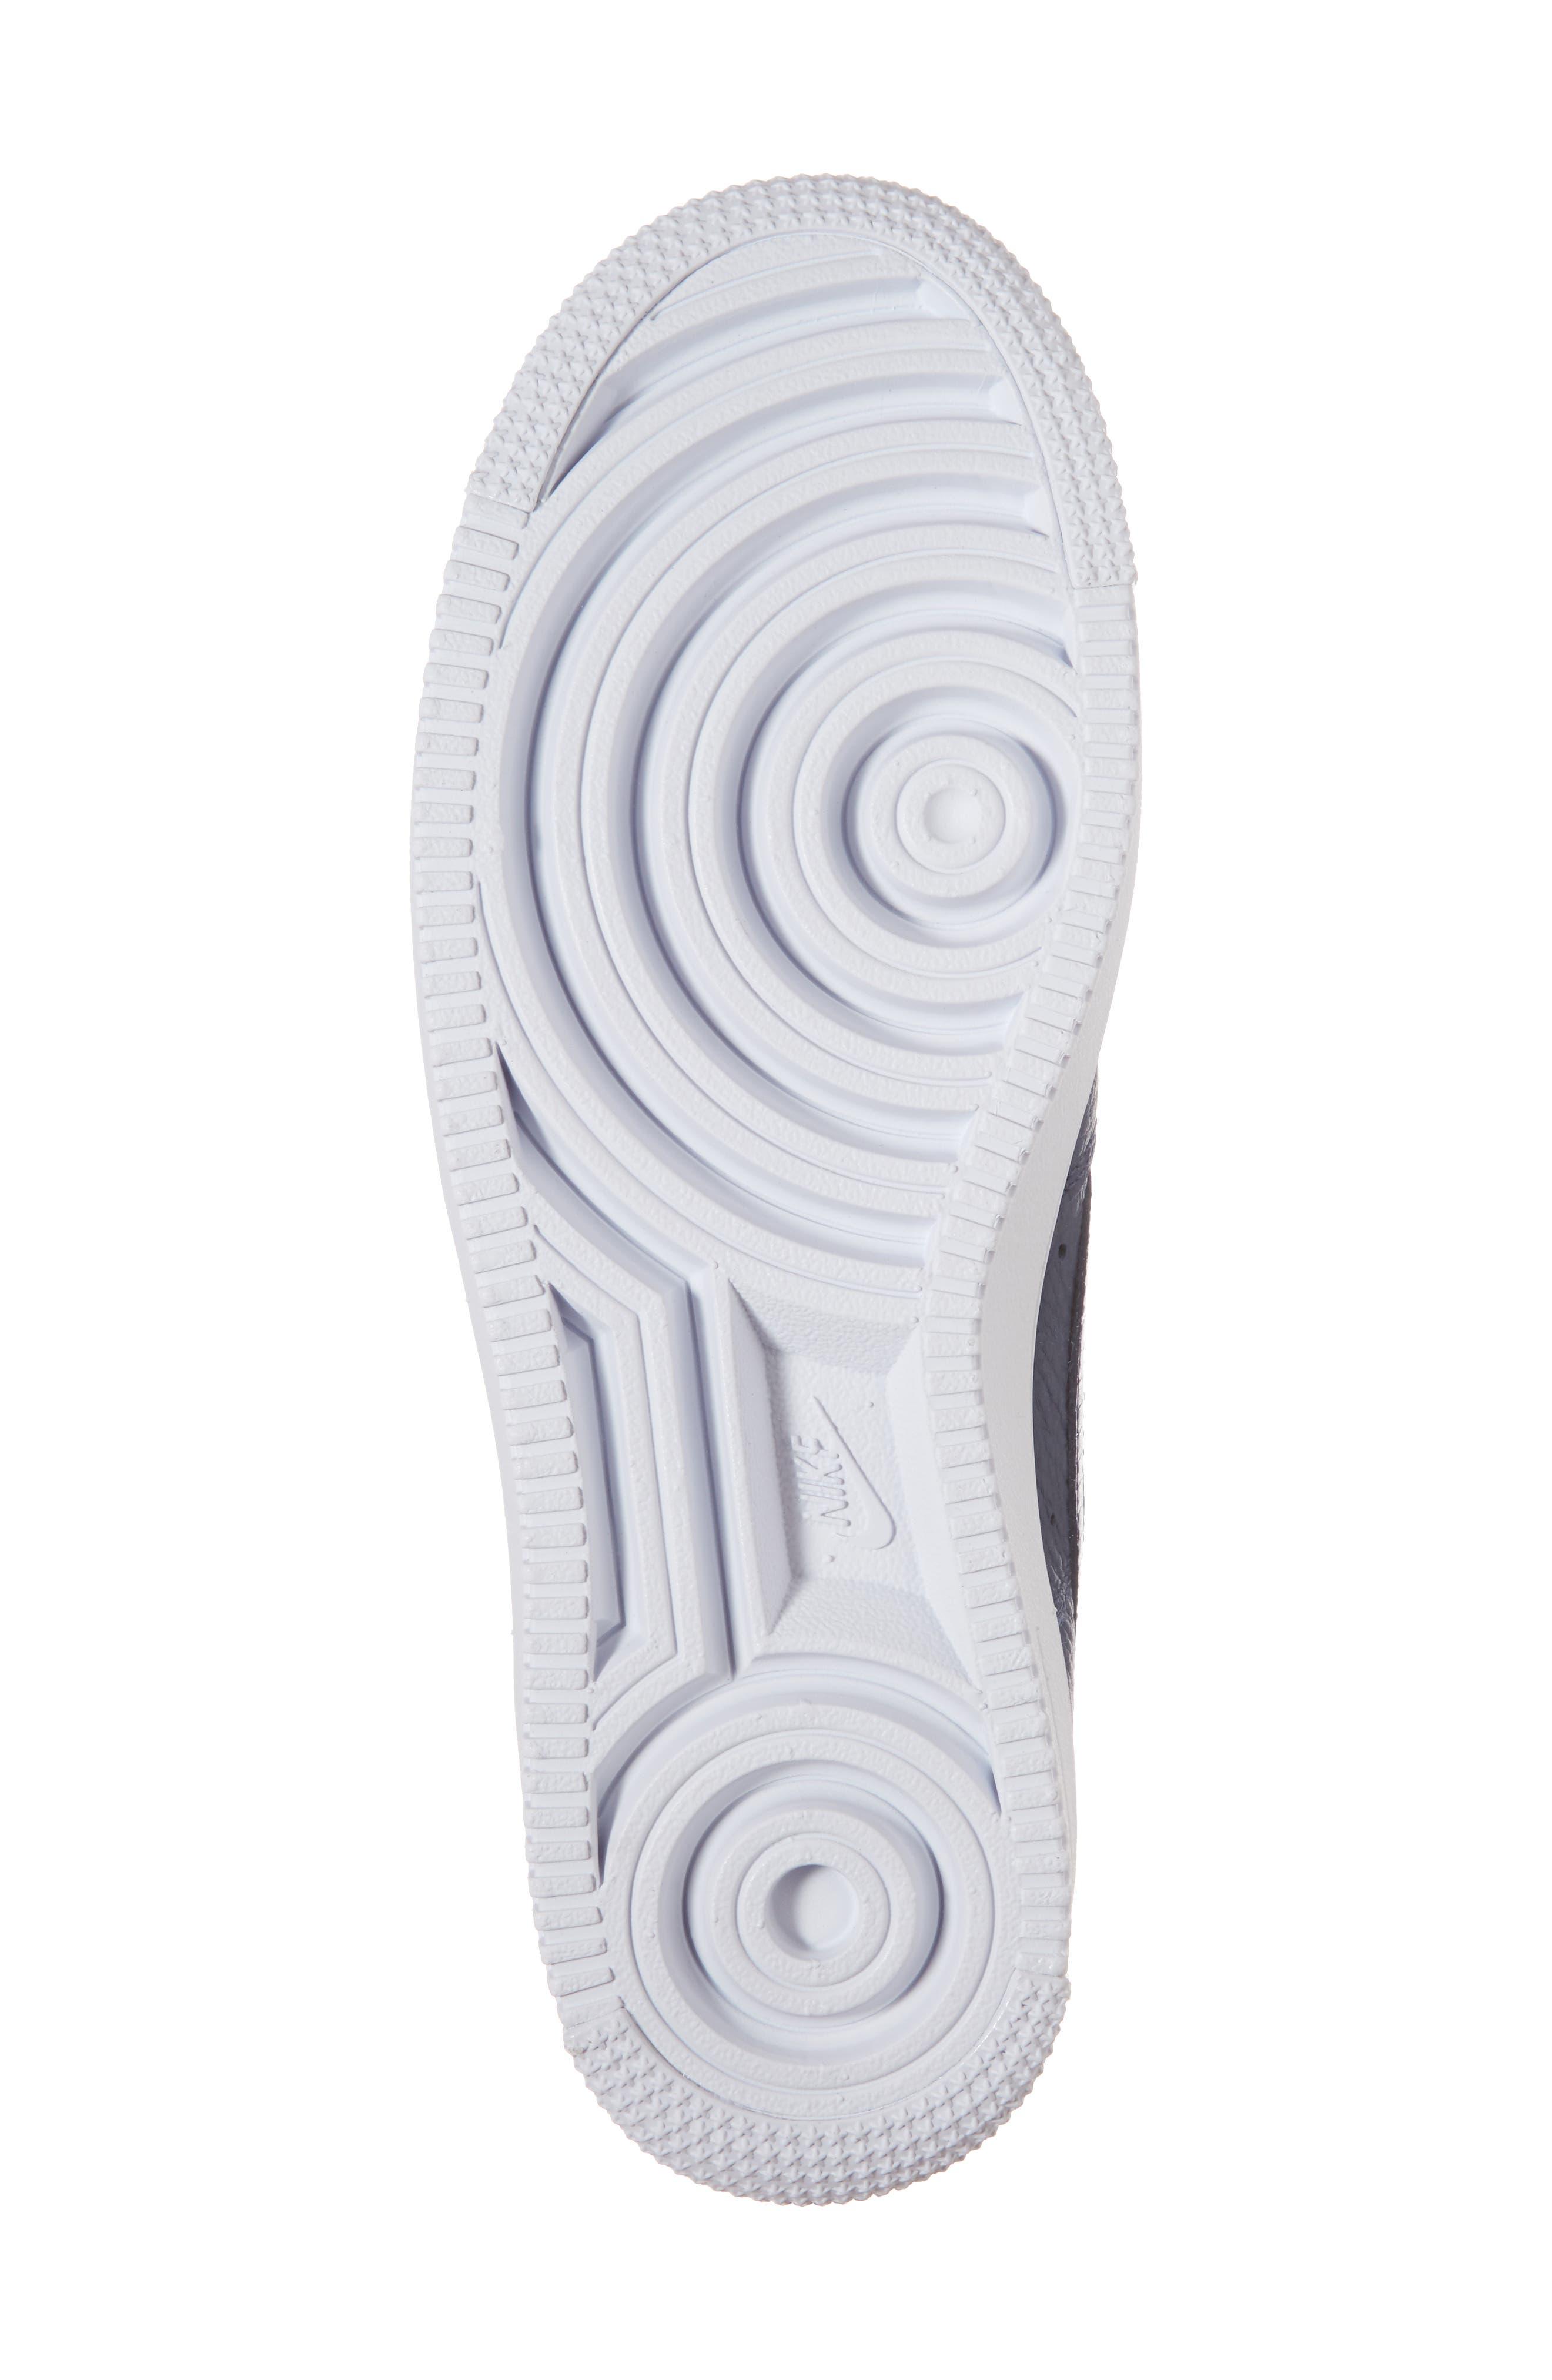 Air Force 1 Ultraforce Sneaker,                             Alternate thumbnail 6, color,                             Navy/ Navy/ White